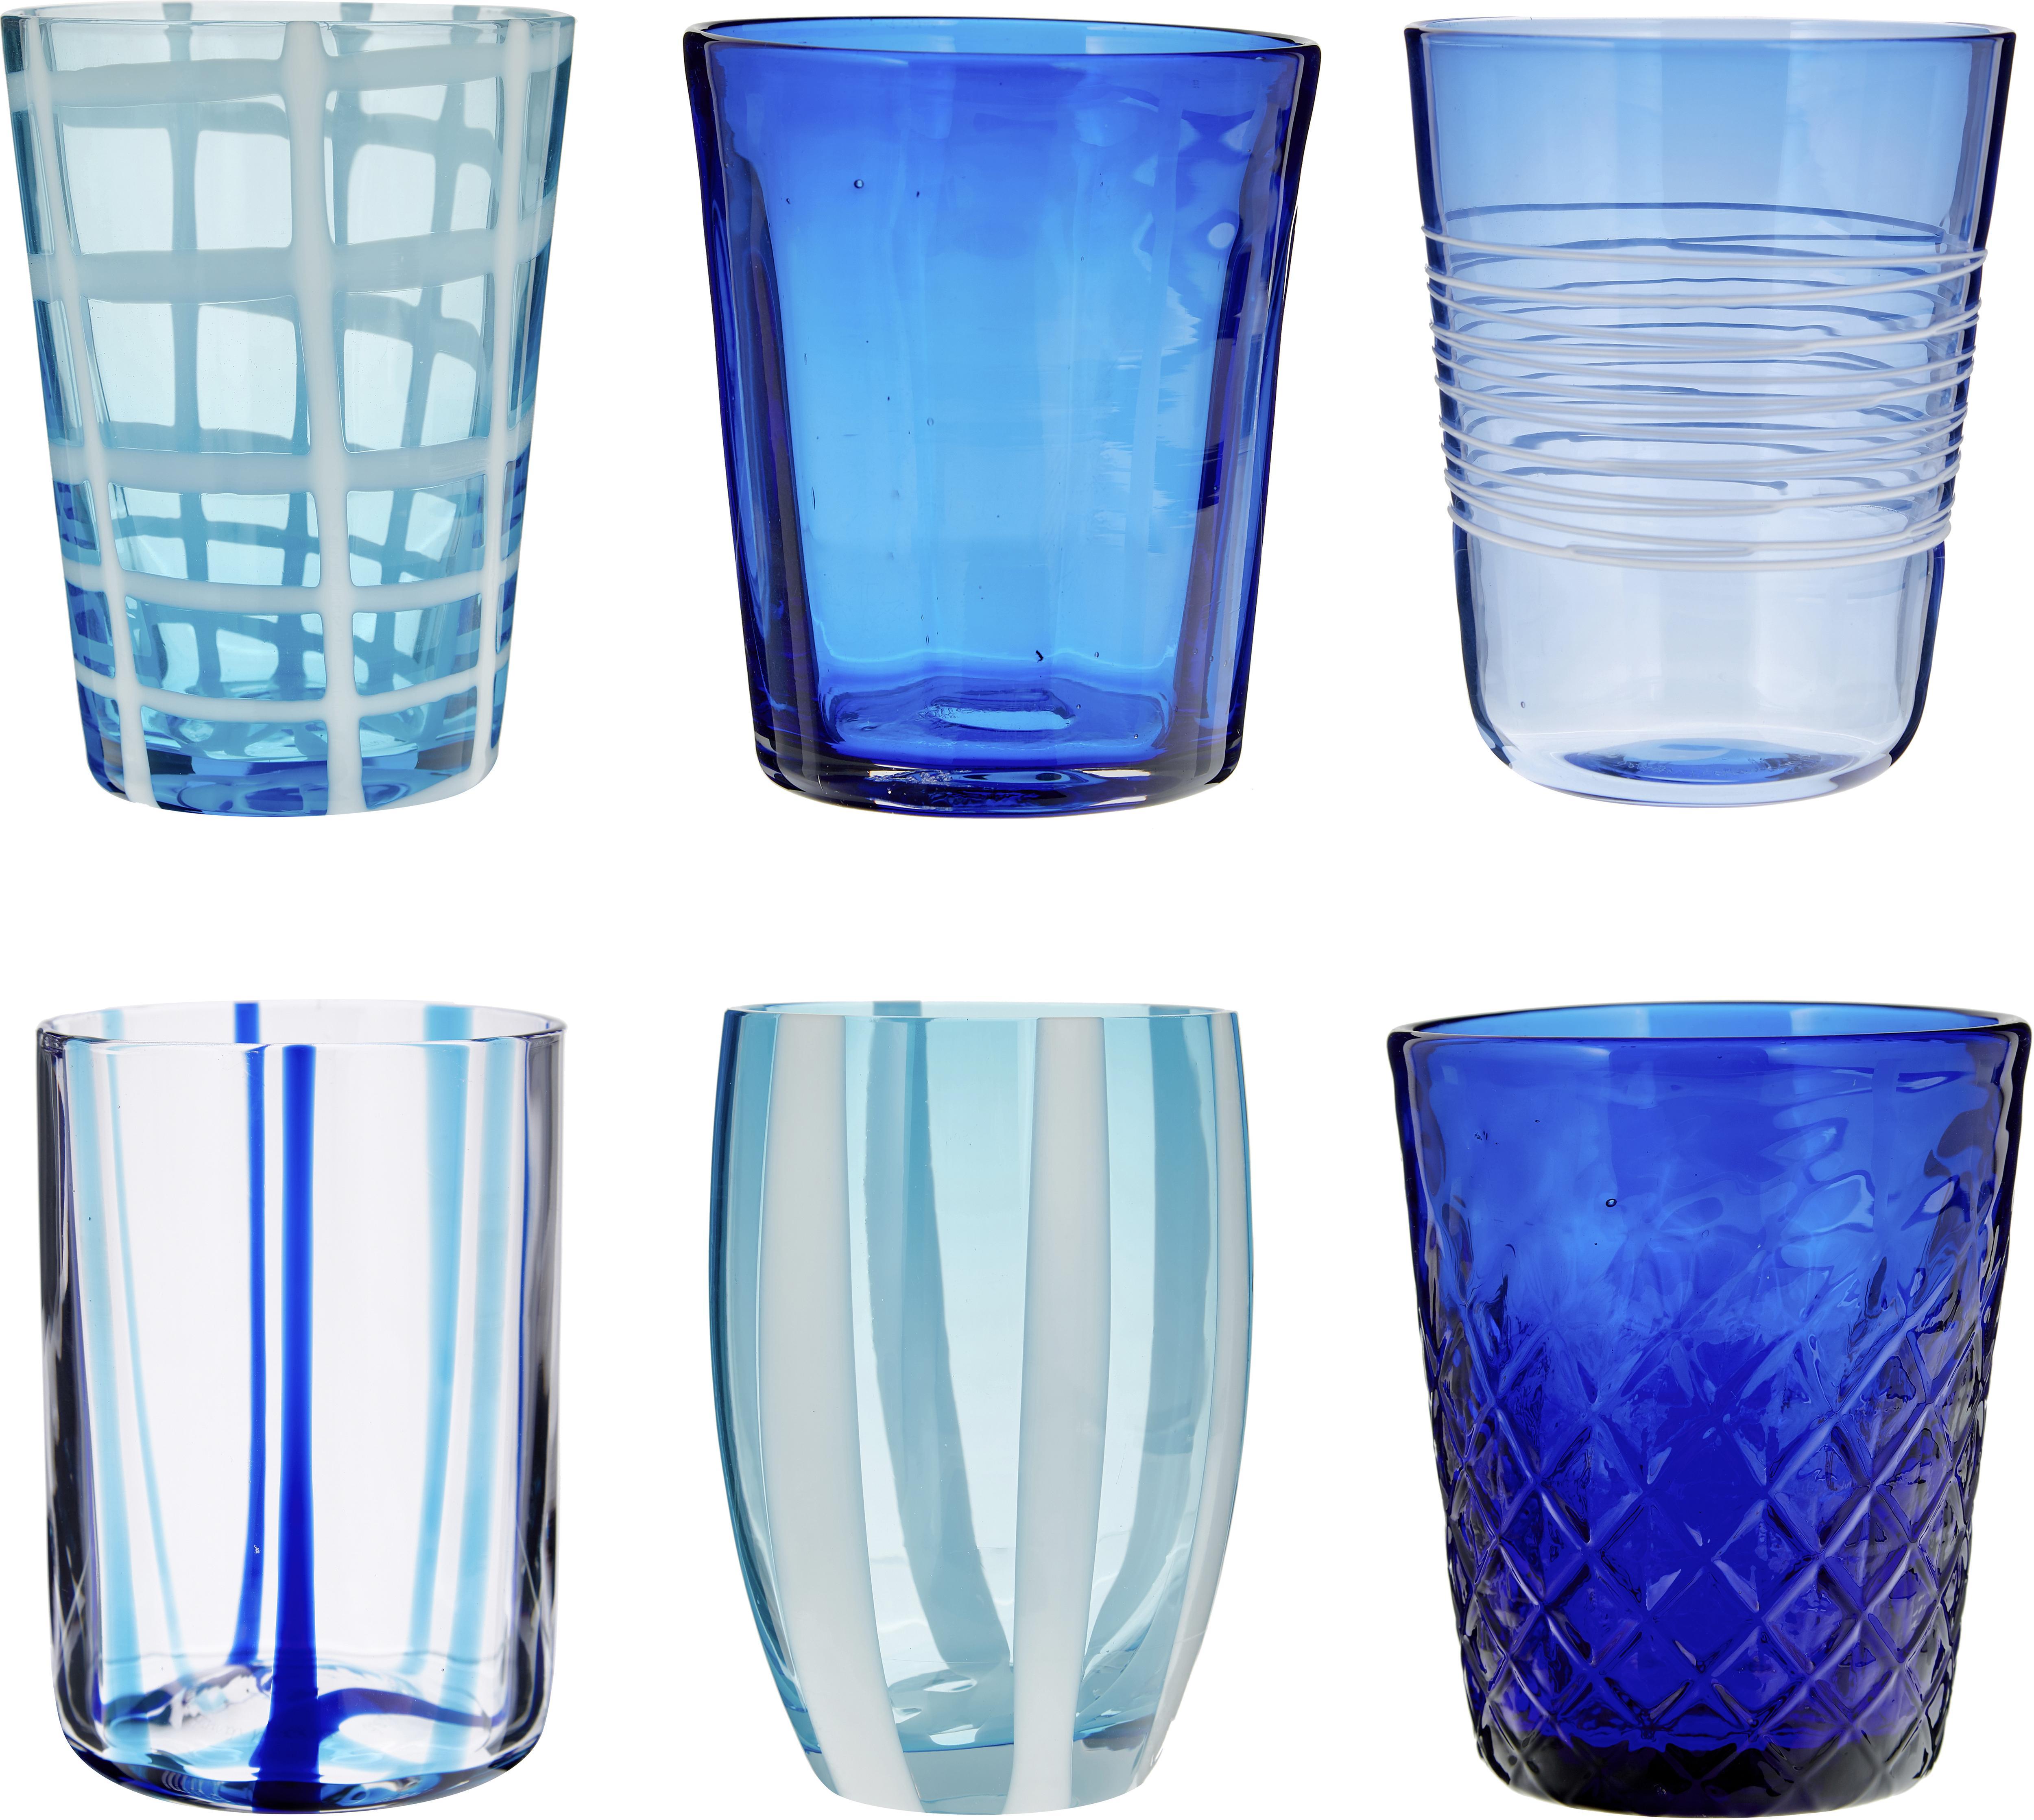 Set 6 bicchieri acqua in vetro Melting Pot Sea, Vetro, Tonalità blu, trasparente, Set in varie misure